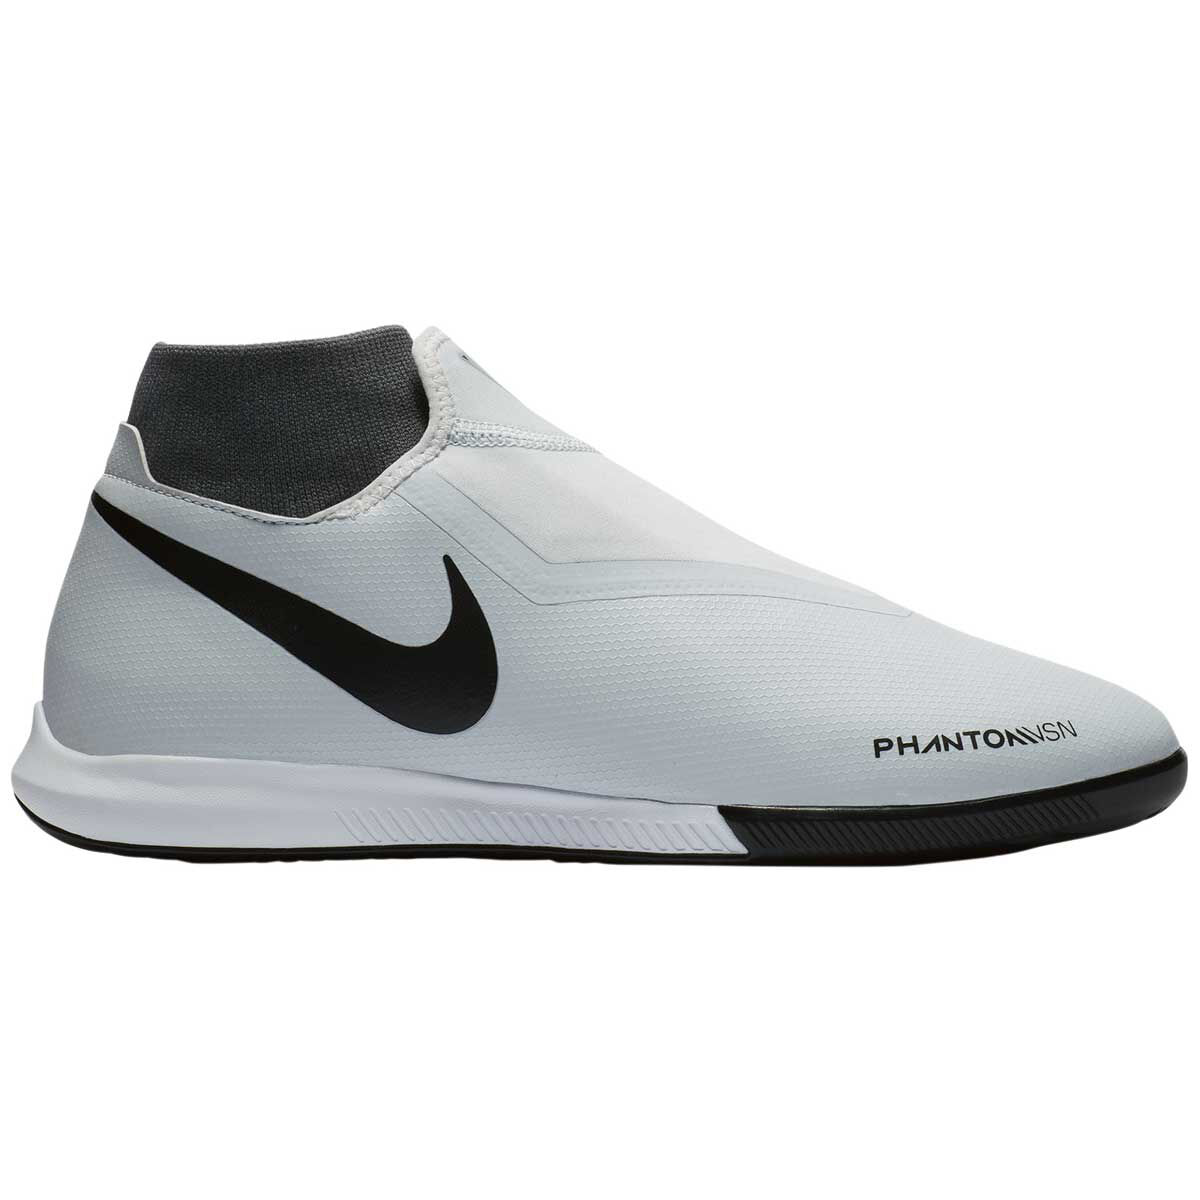 Nike Phantom Visionx Academy Mens Indoor Shoe Sport Sale